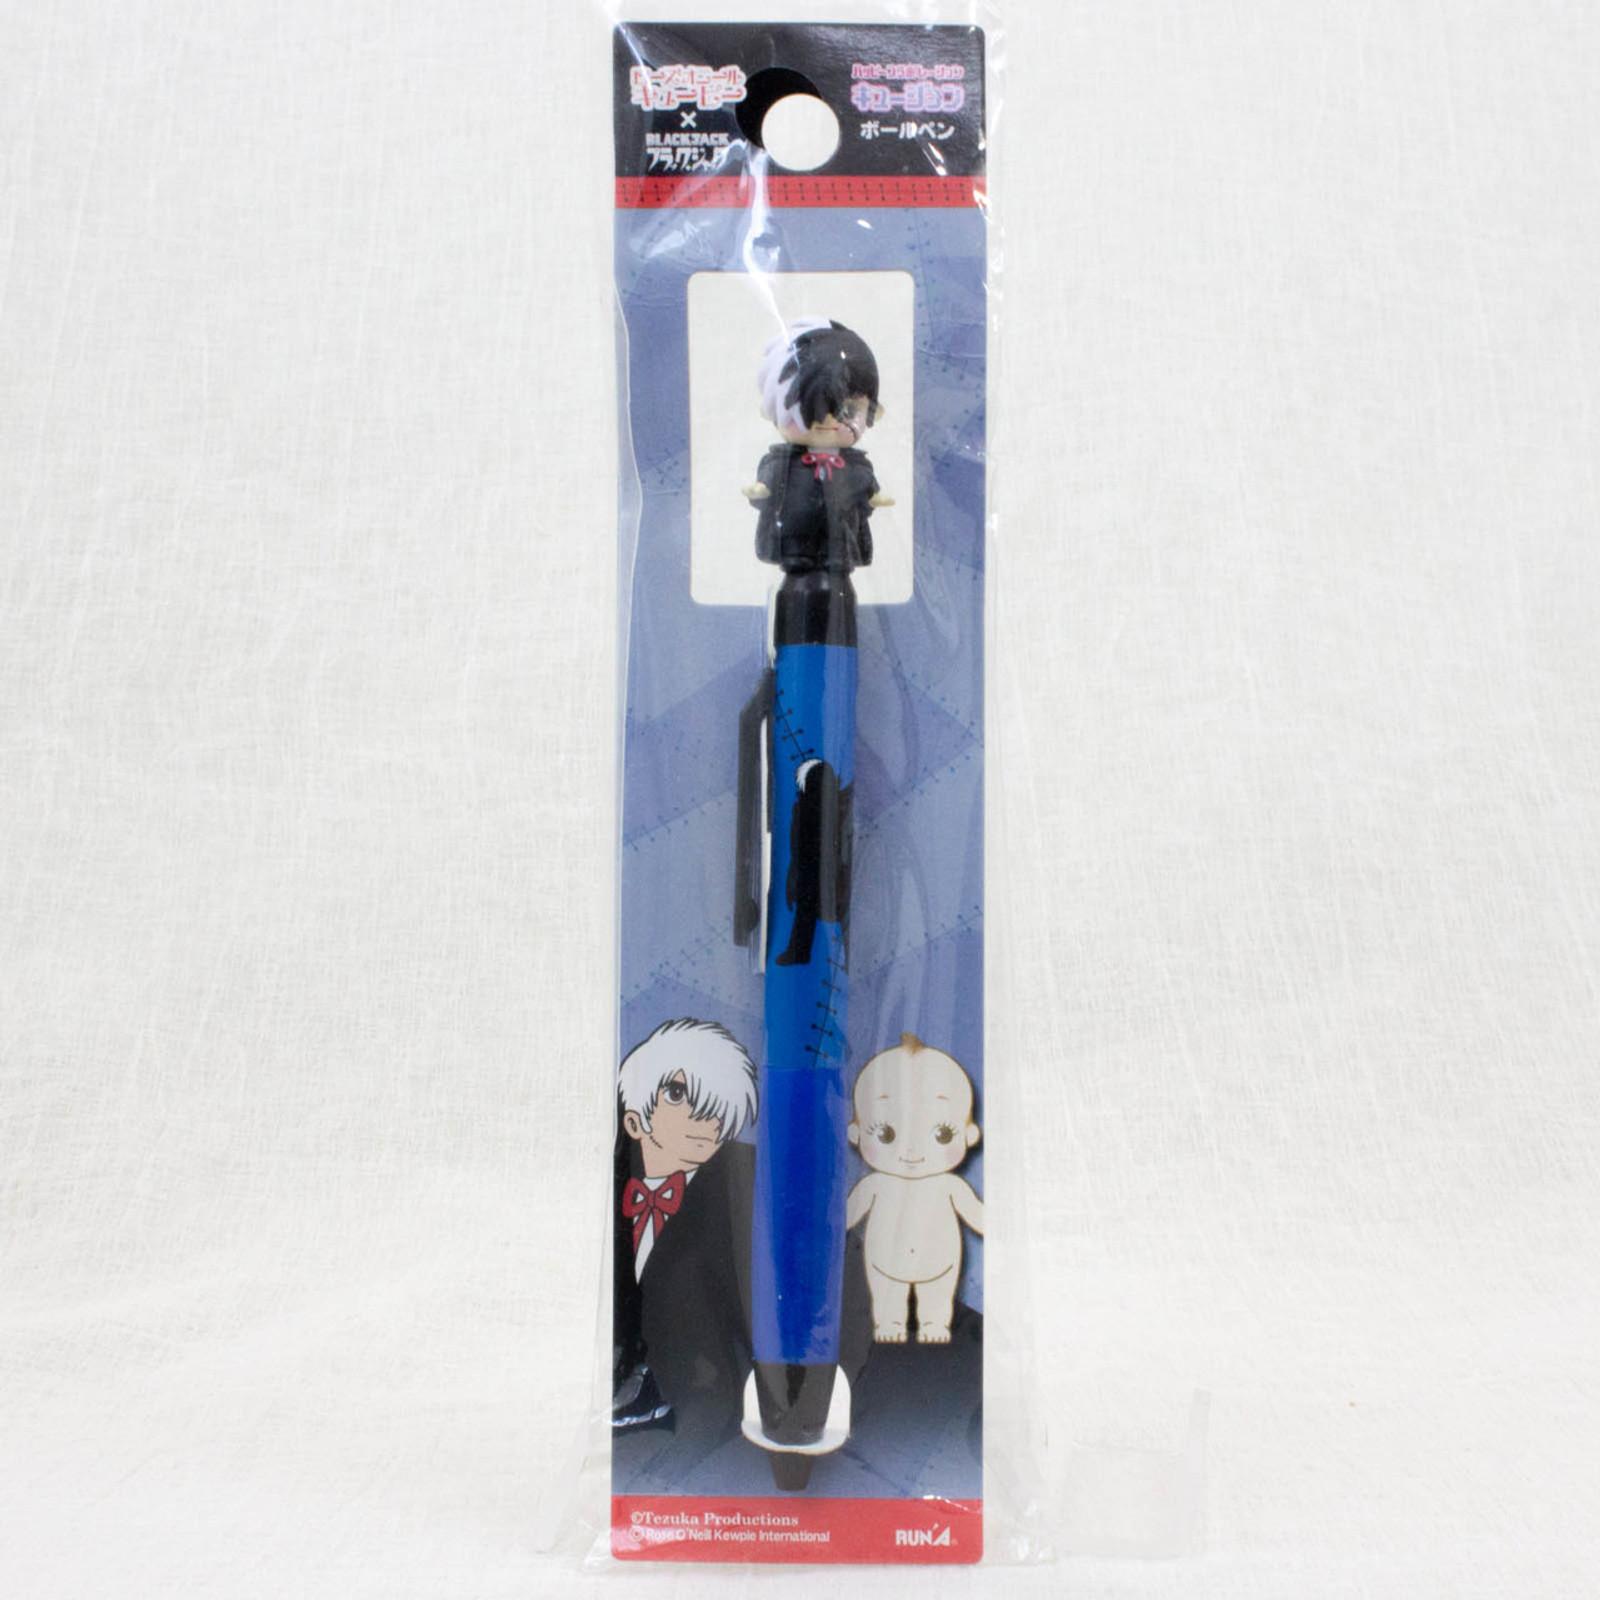 Black Jack Tezuka Osamu Rose O'neill Kewpie Kewsion Ballpoint Pen JAPAN ANIME